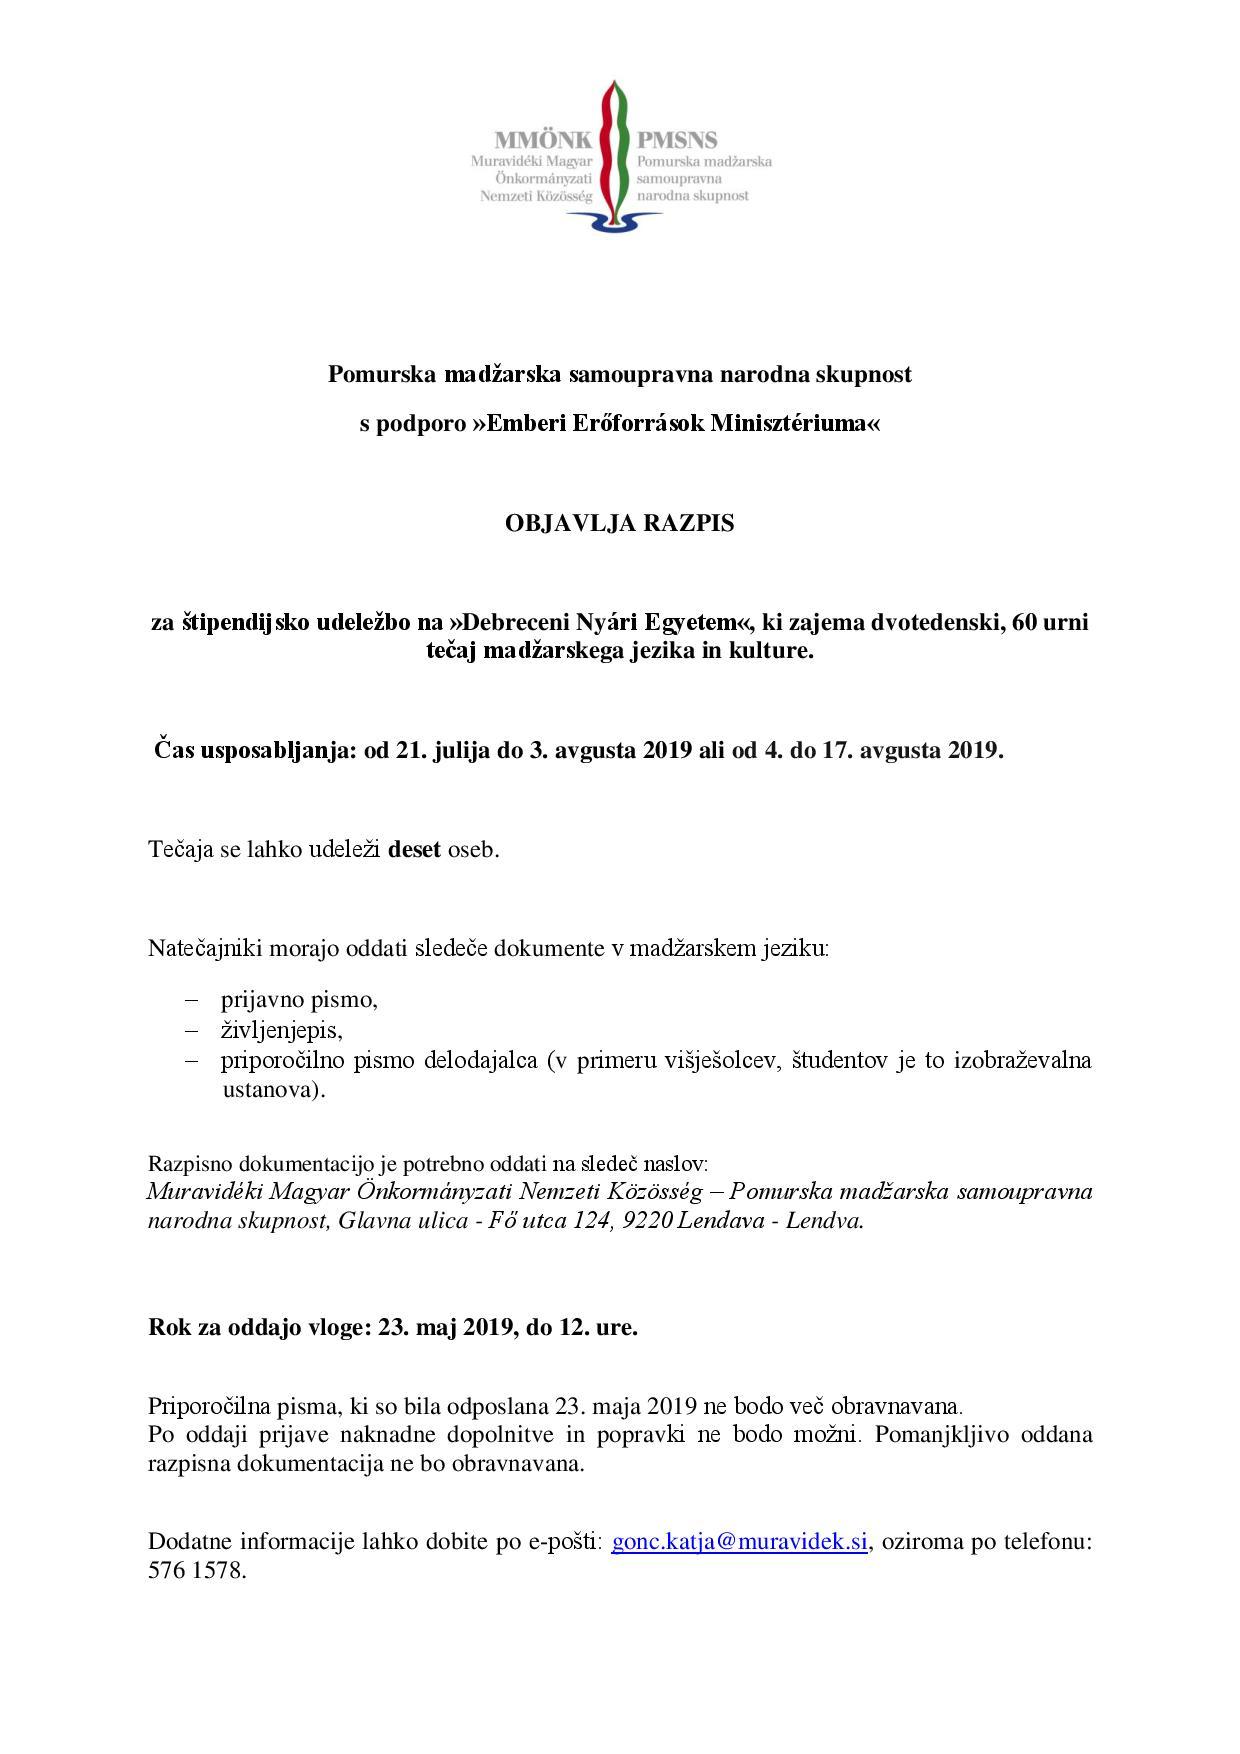 debreceni-nyari-egyetem_2019_palyazat-slo